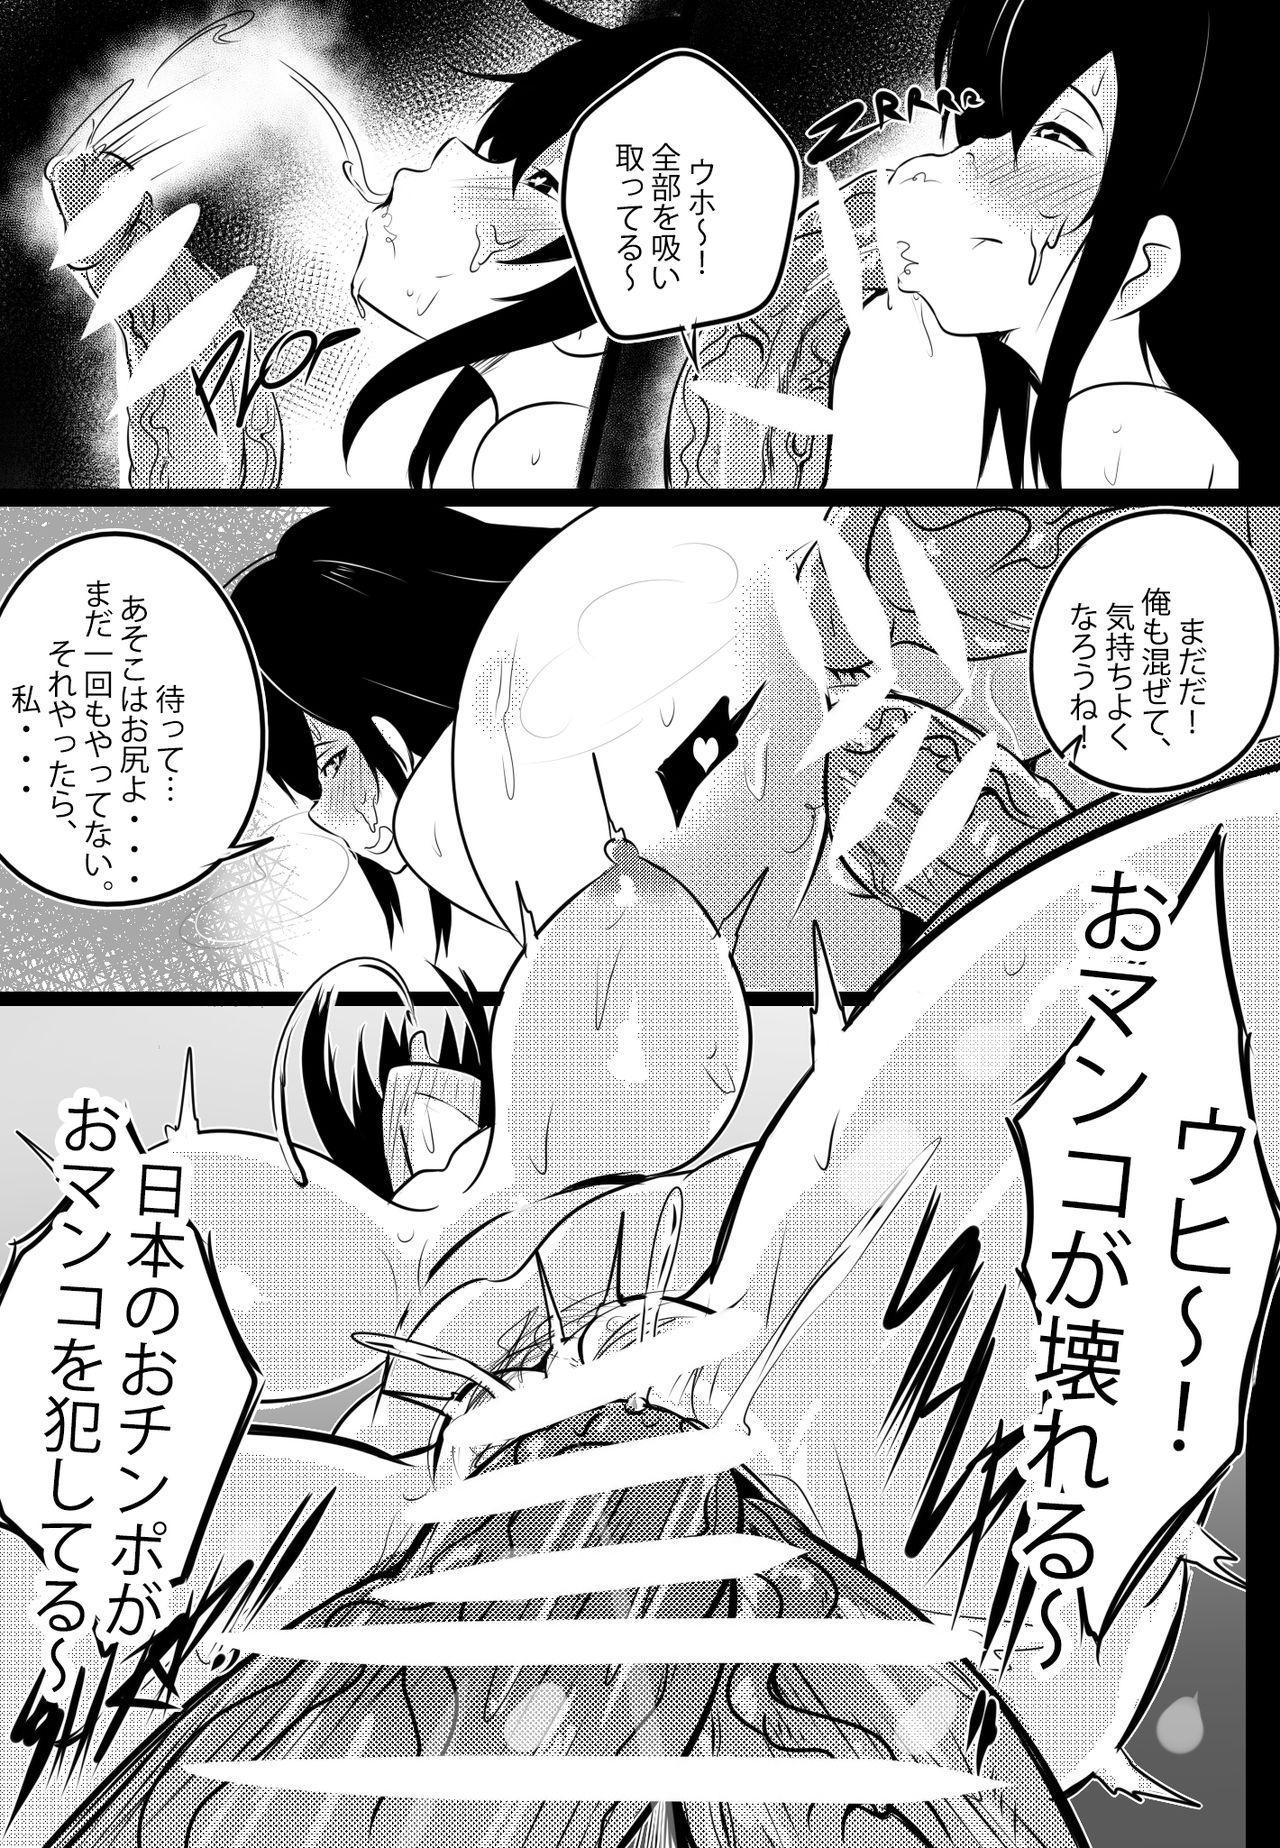 B-Trayal 22 Akeno (Censored)JP 13